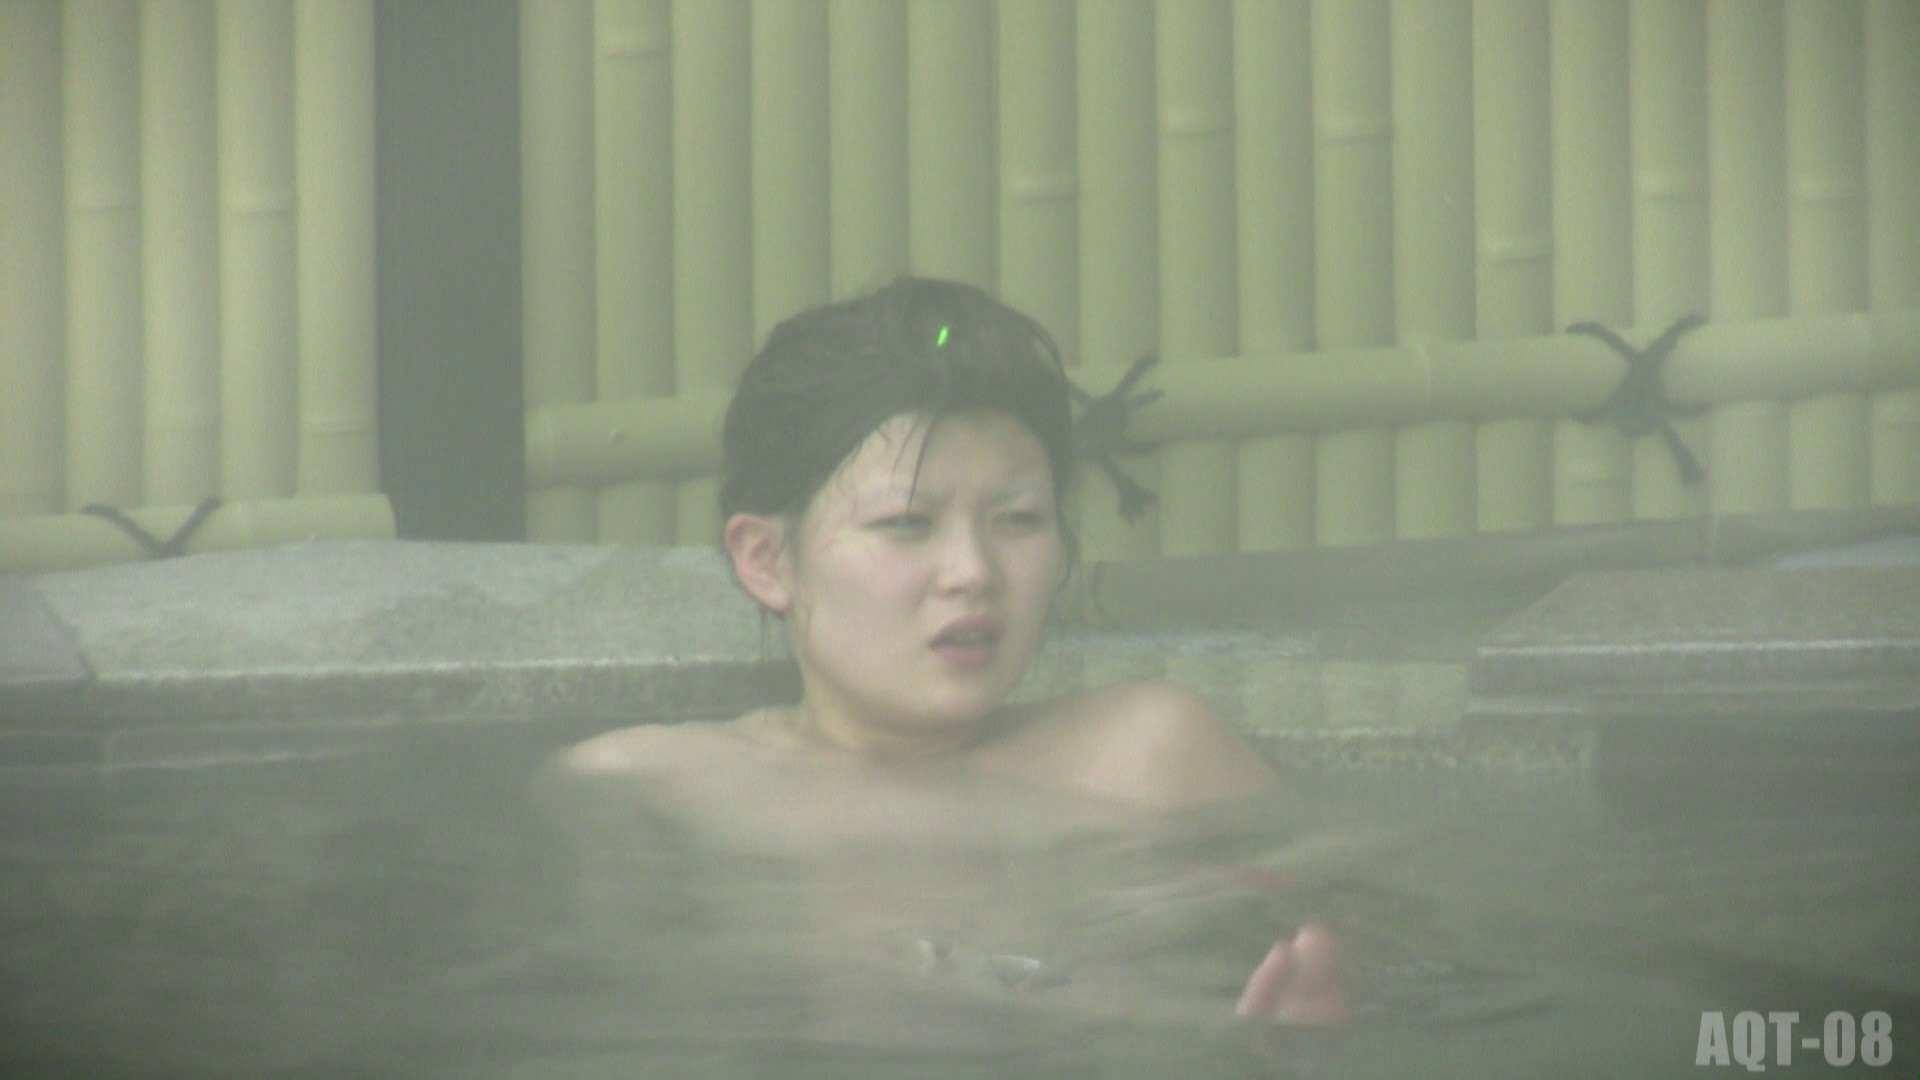 Aquaな露天風呂Vol.777 盗撮師作品 オメコ無修正動画無料 101pic 26